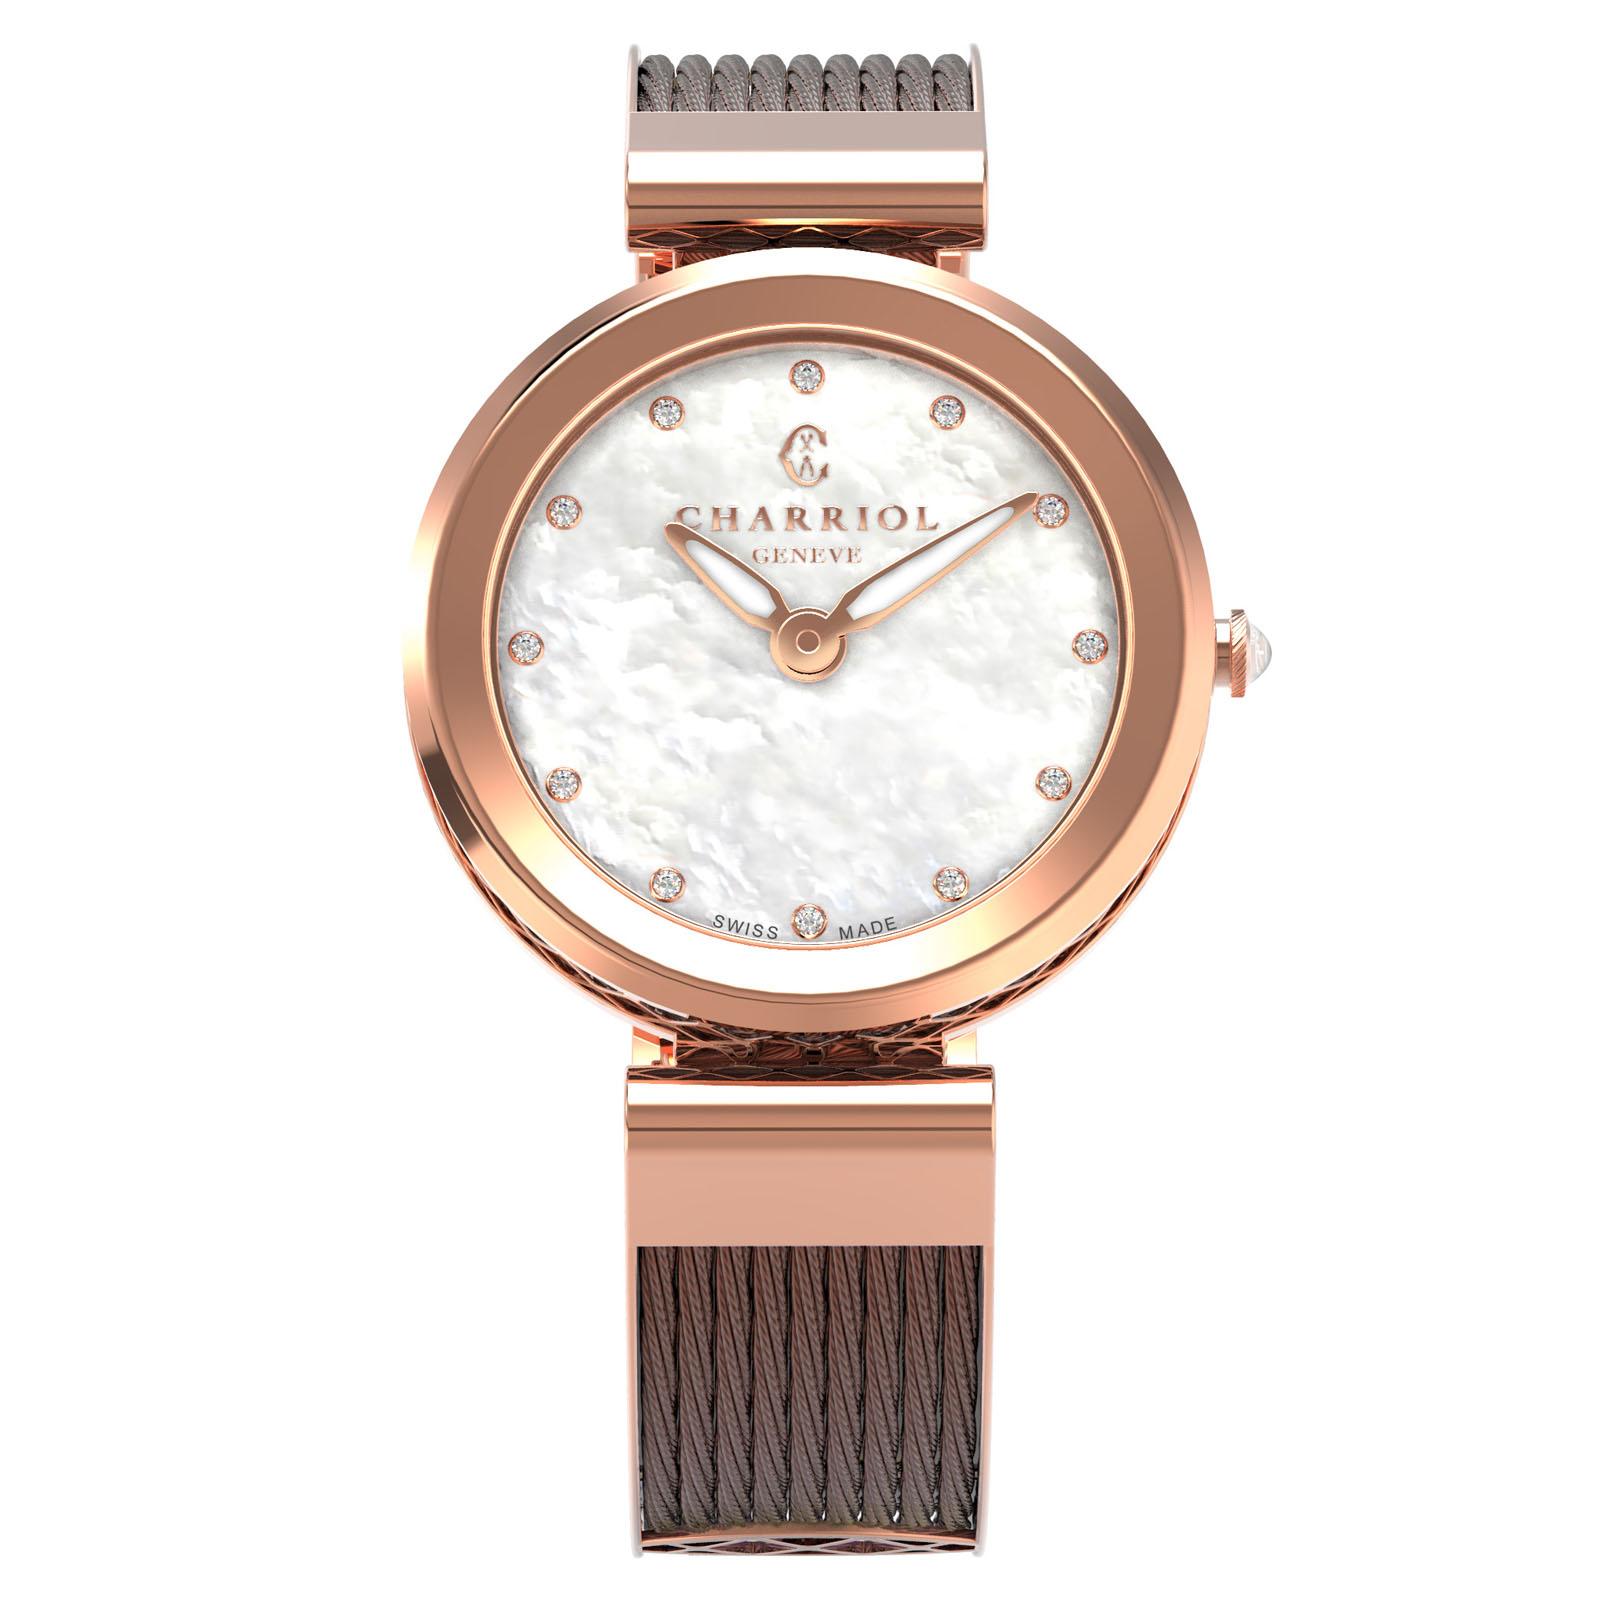 CHARRIOL夏利豪(FE32.602.005)Forever系列半鋼索經典時尚腕錶/珍珠母貝面32mm